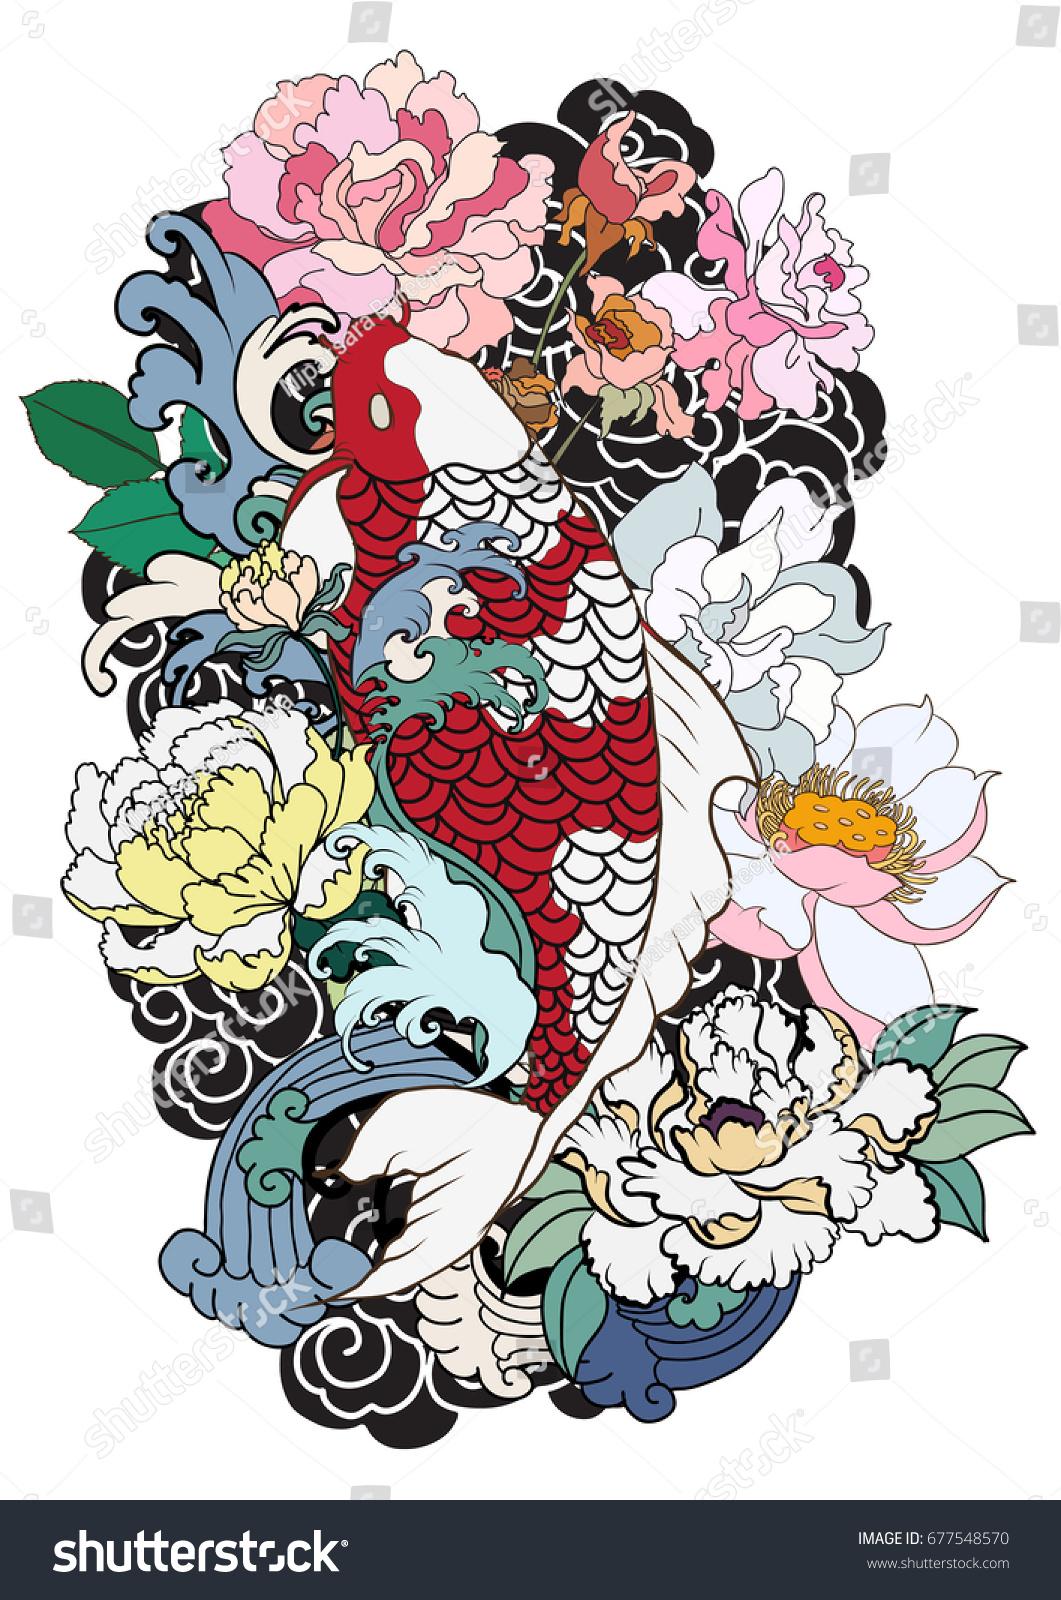 Hand drawn koi fish flower tattoo stock vector 677548570 shutterstock hand drawn koi fish with flower tattoo for armlorful koi carp with water splash izmirmasajfo